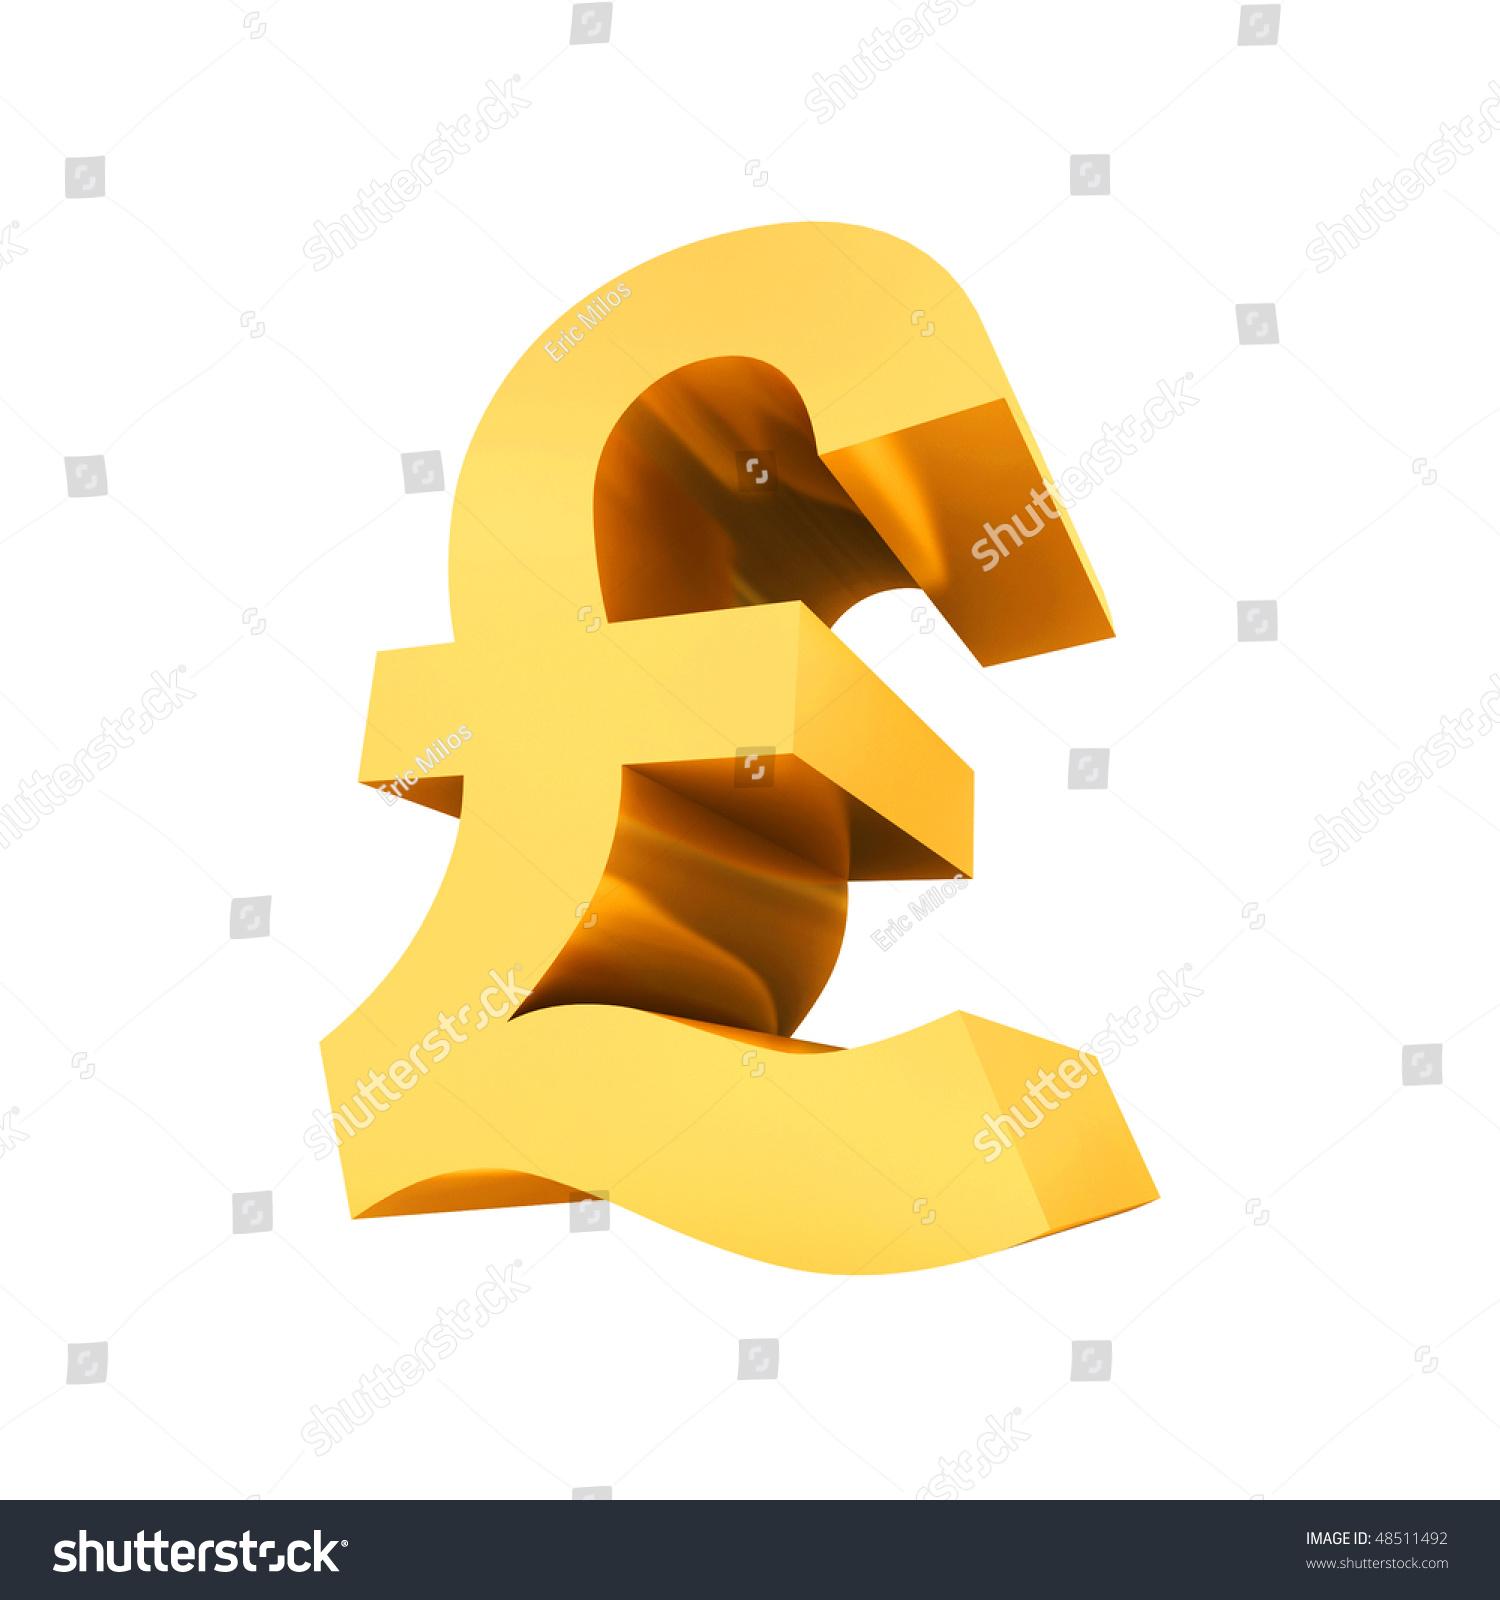 Uk pound symbol stock illustration 48511492 shutterstock uk pound symbol buycottarizona